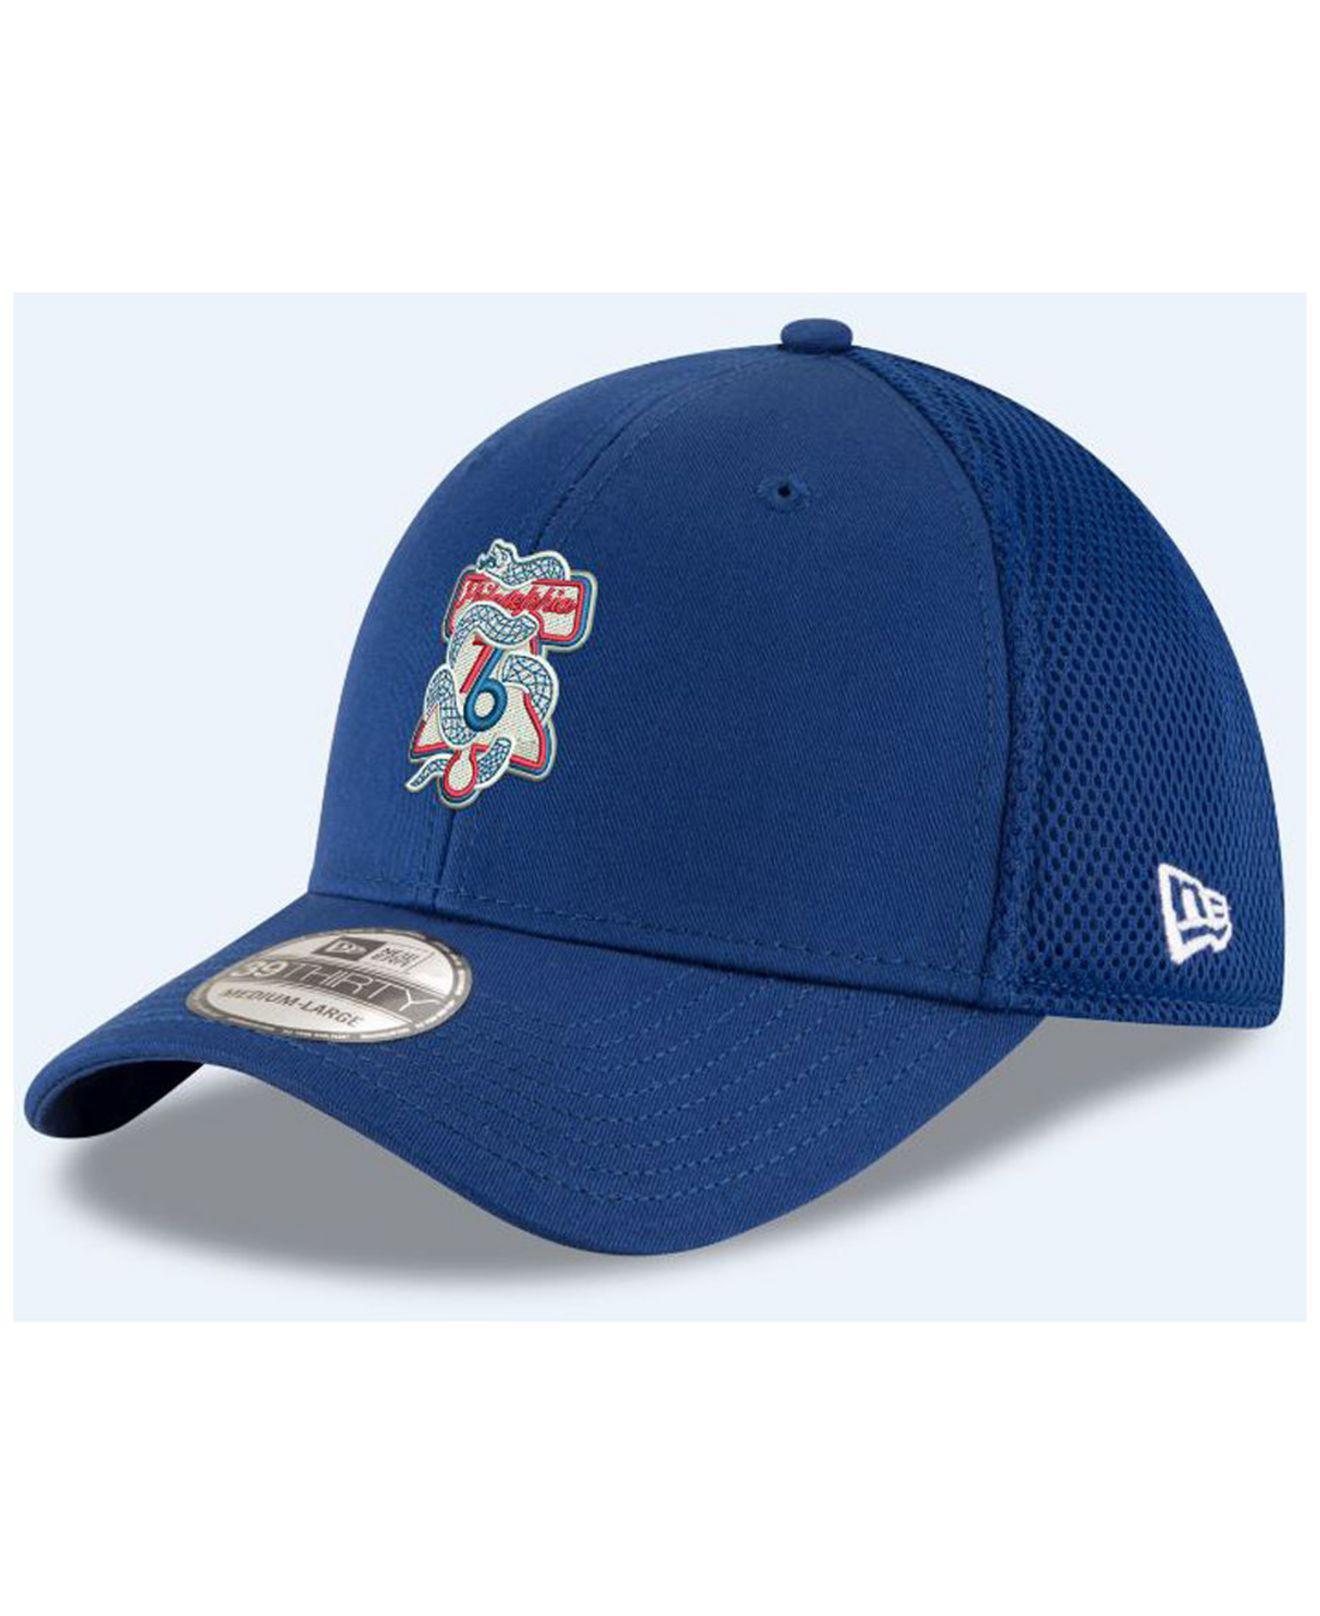 huge selection of 7e1aa 5d181 ... 9fifty snapback cap ca9a7 82847  new zealand ktz. mens blue philadelphia  76ers alternate logo 39thirty cap 0b1ea d3514